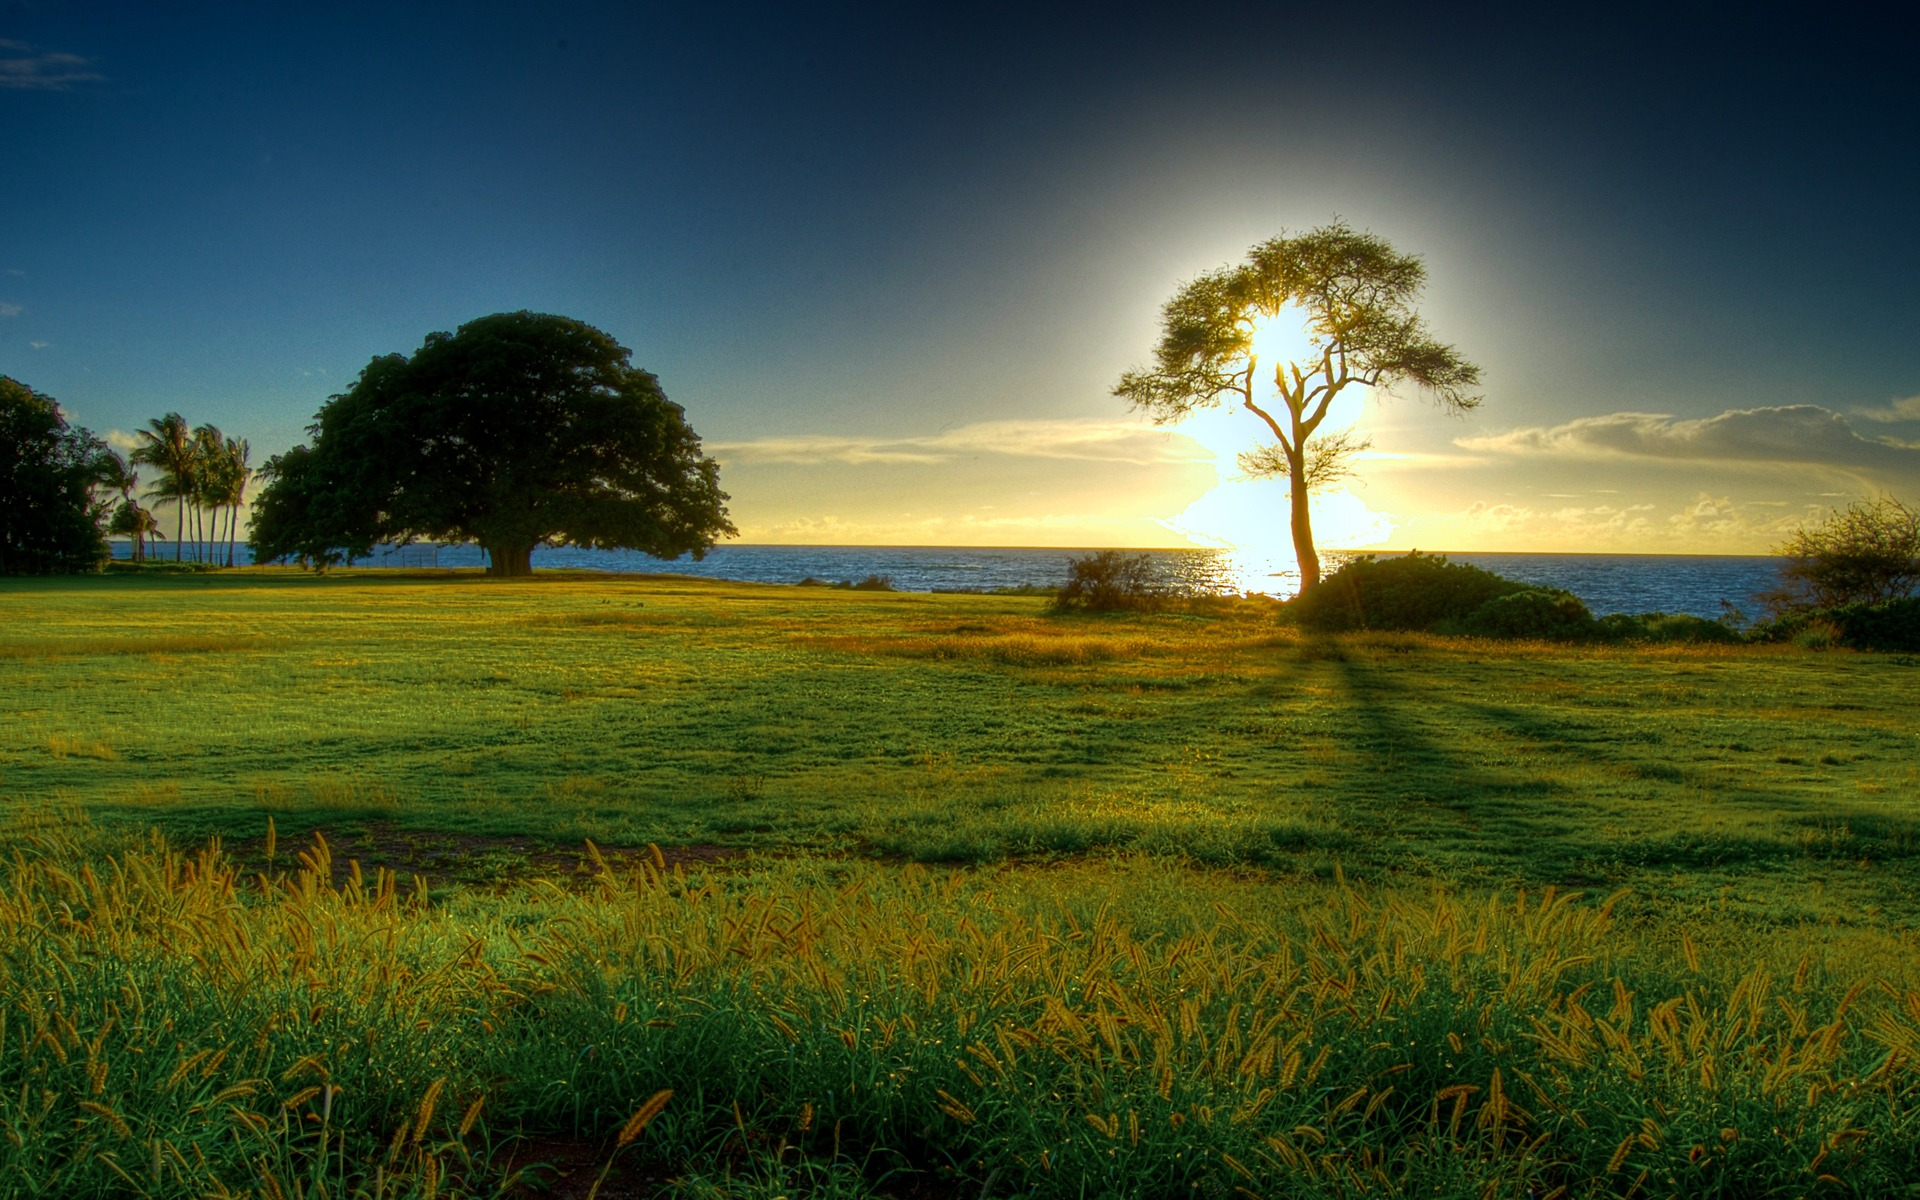 spring-wild-field-nature